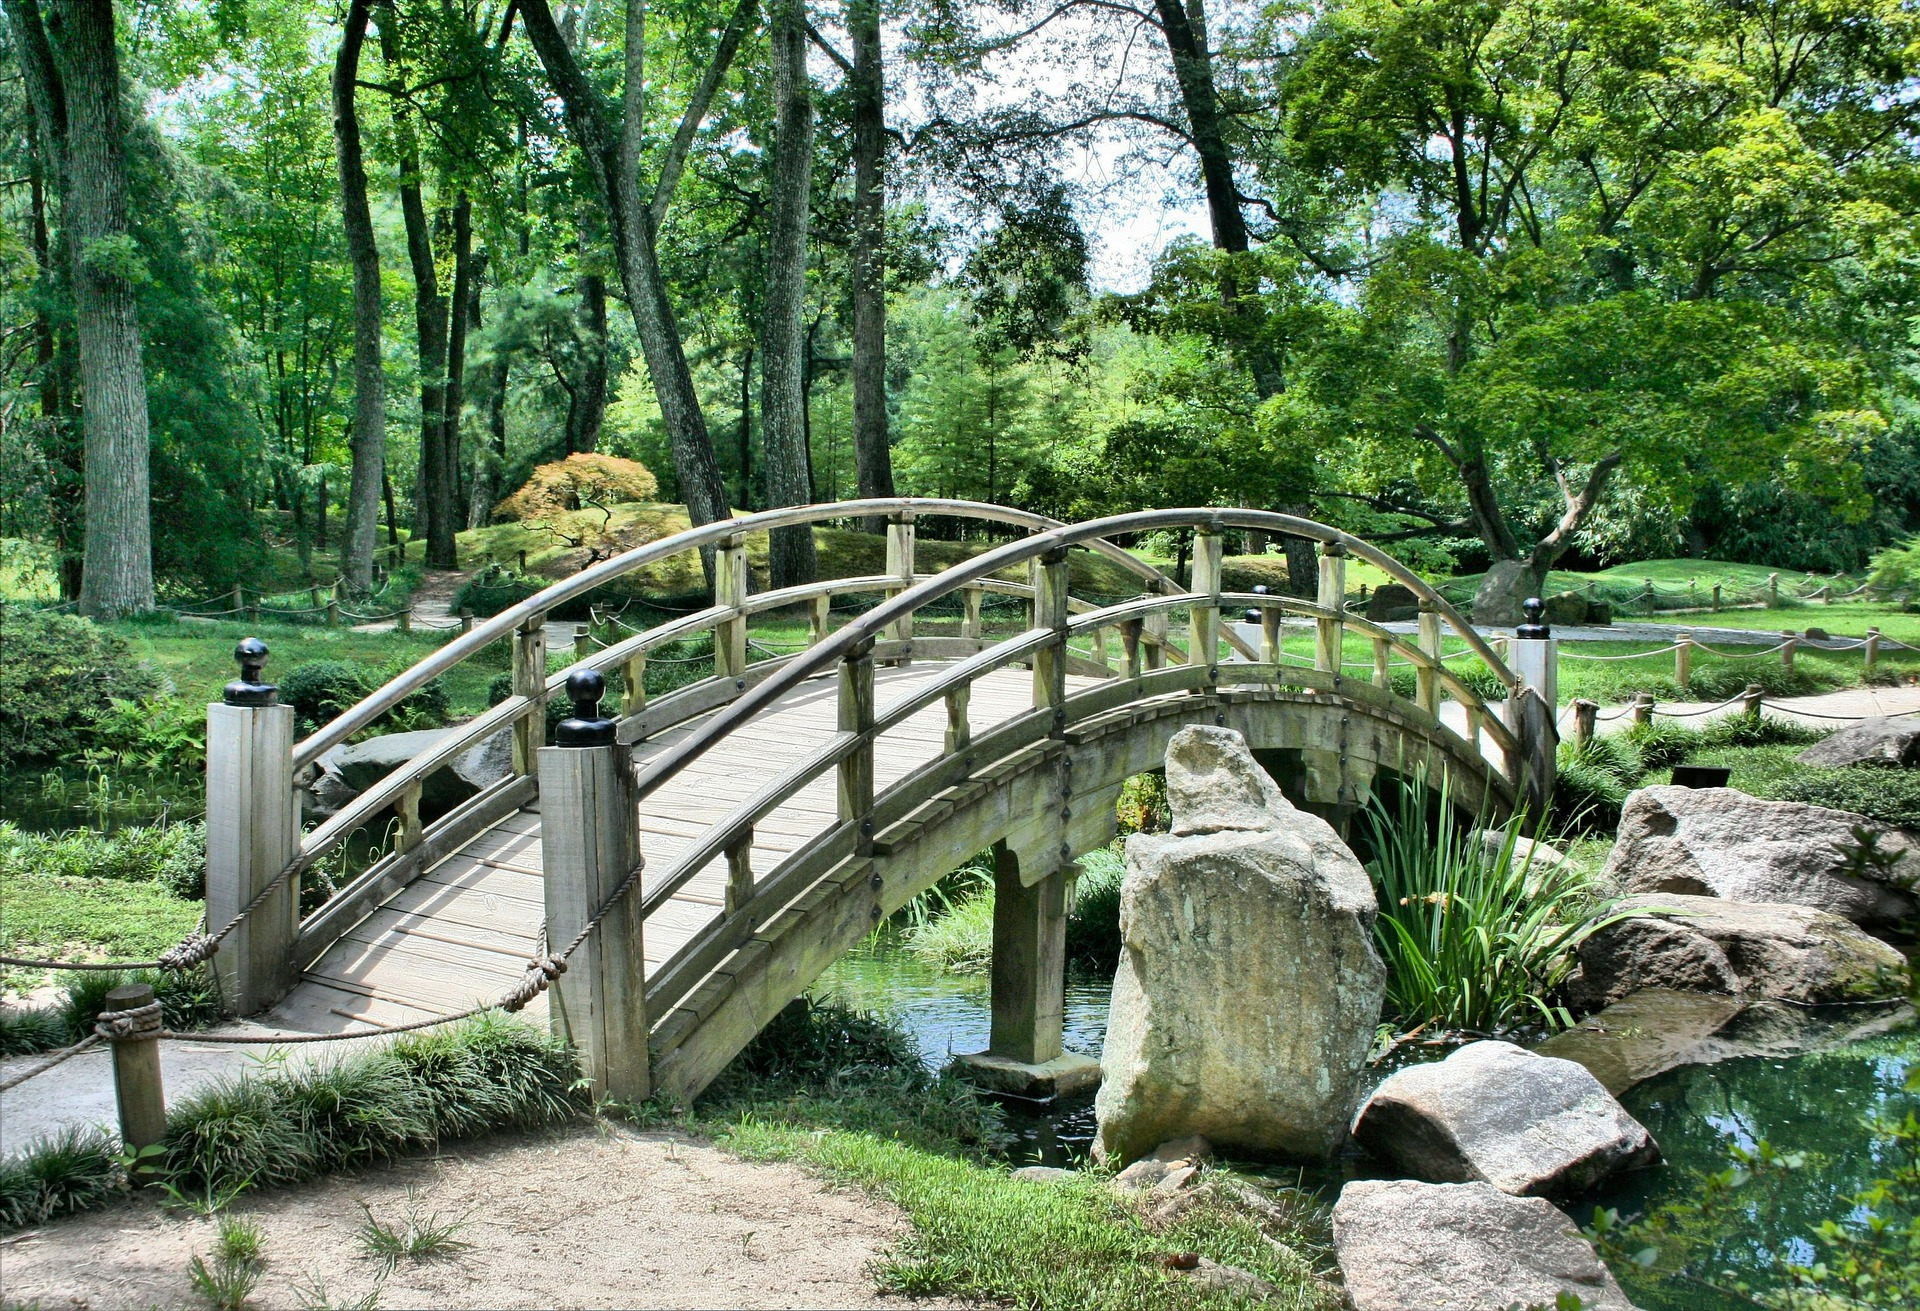 Japanischer Garten, Brücke, Rest, Entspannen Sie sich, Meditation - Wallpaper HD - Prof.-falken.com